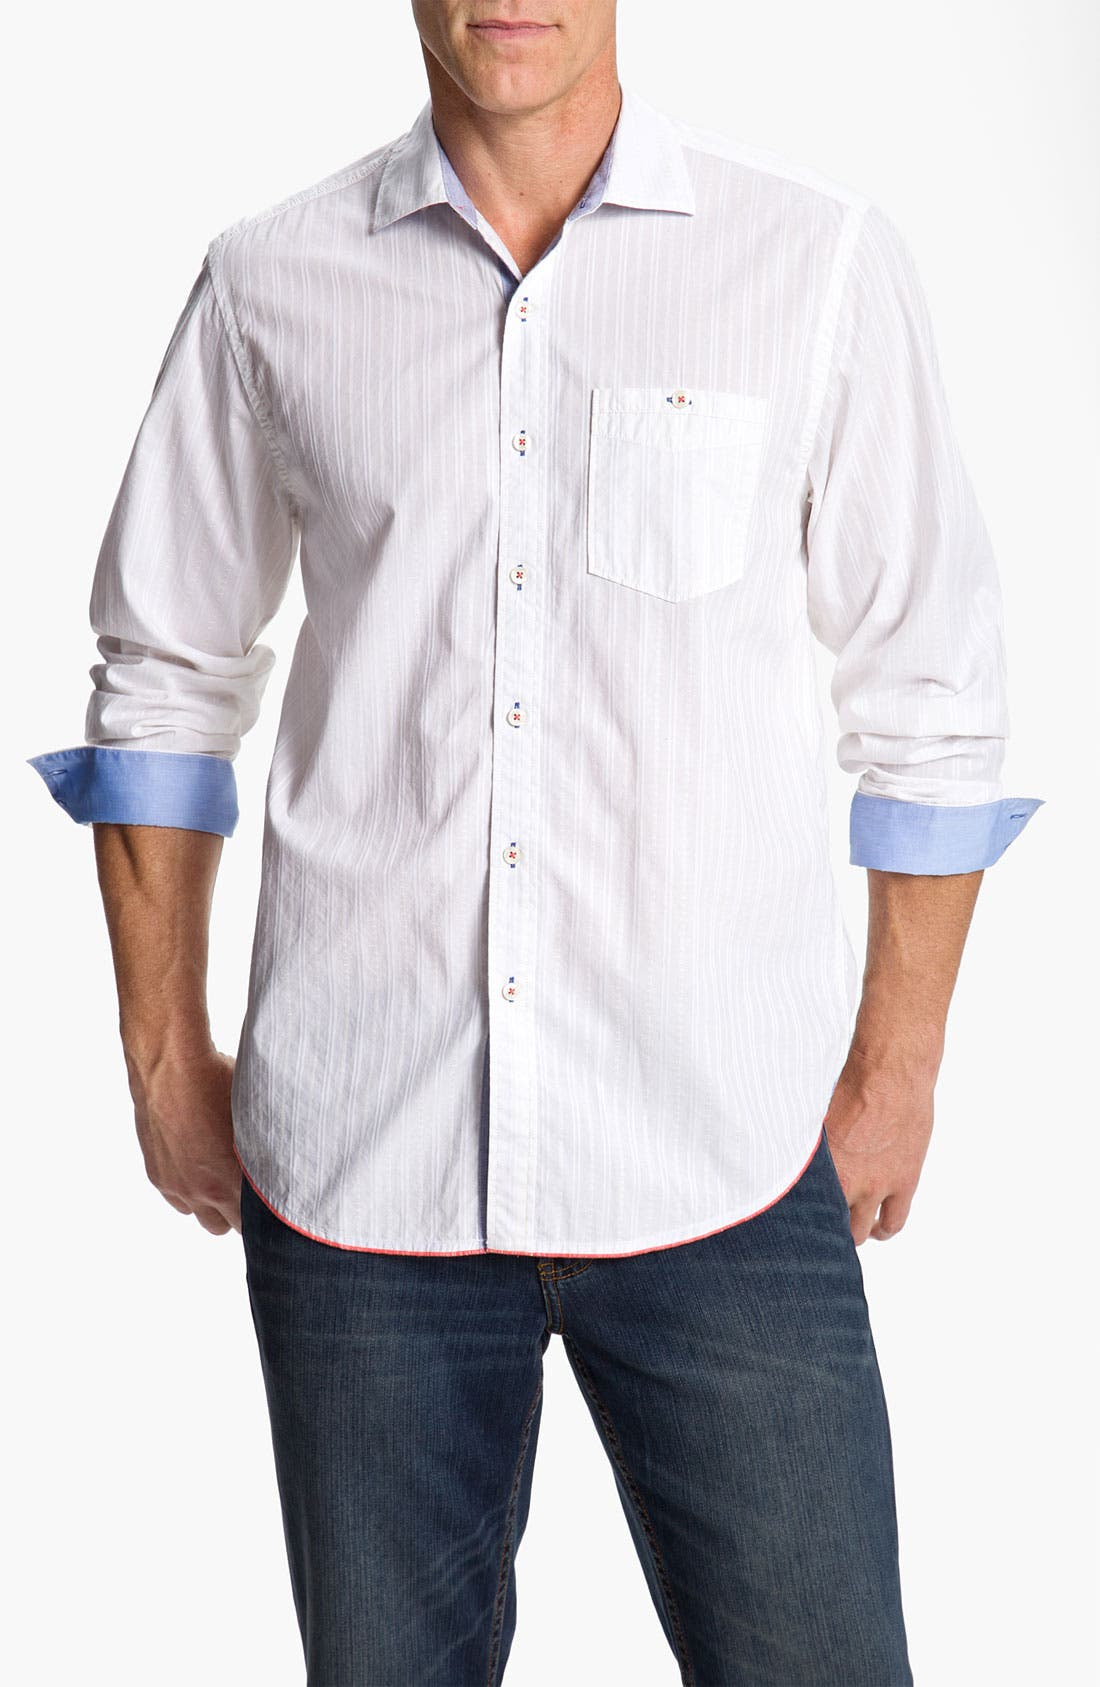 Alternate Image 1 Selected - Tommy Bahama Denim 'Destination Dobby' Sport Shirt